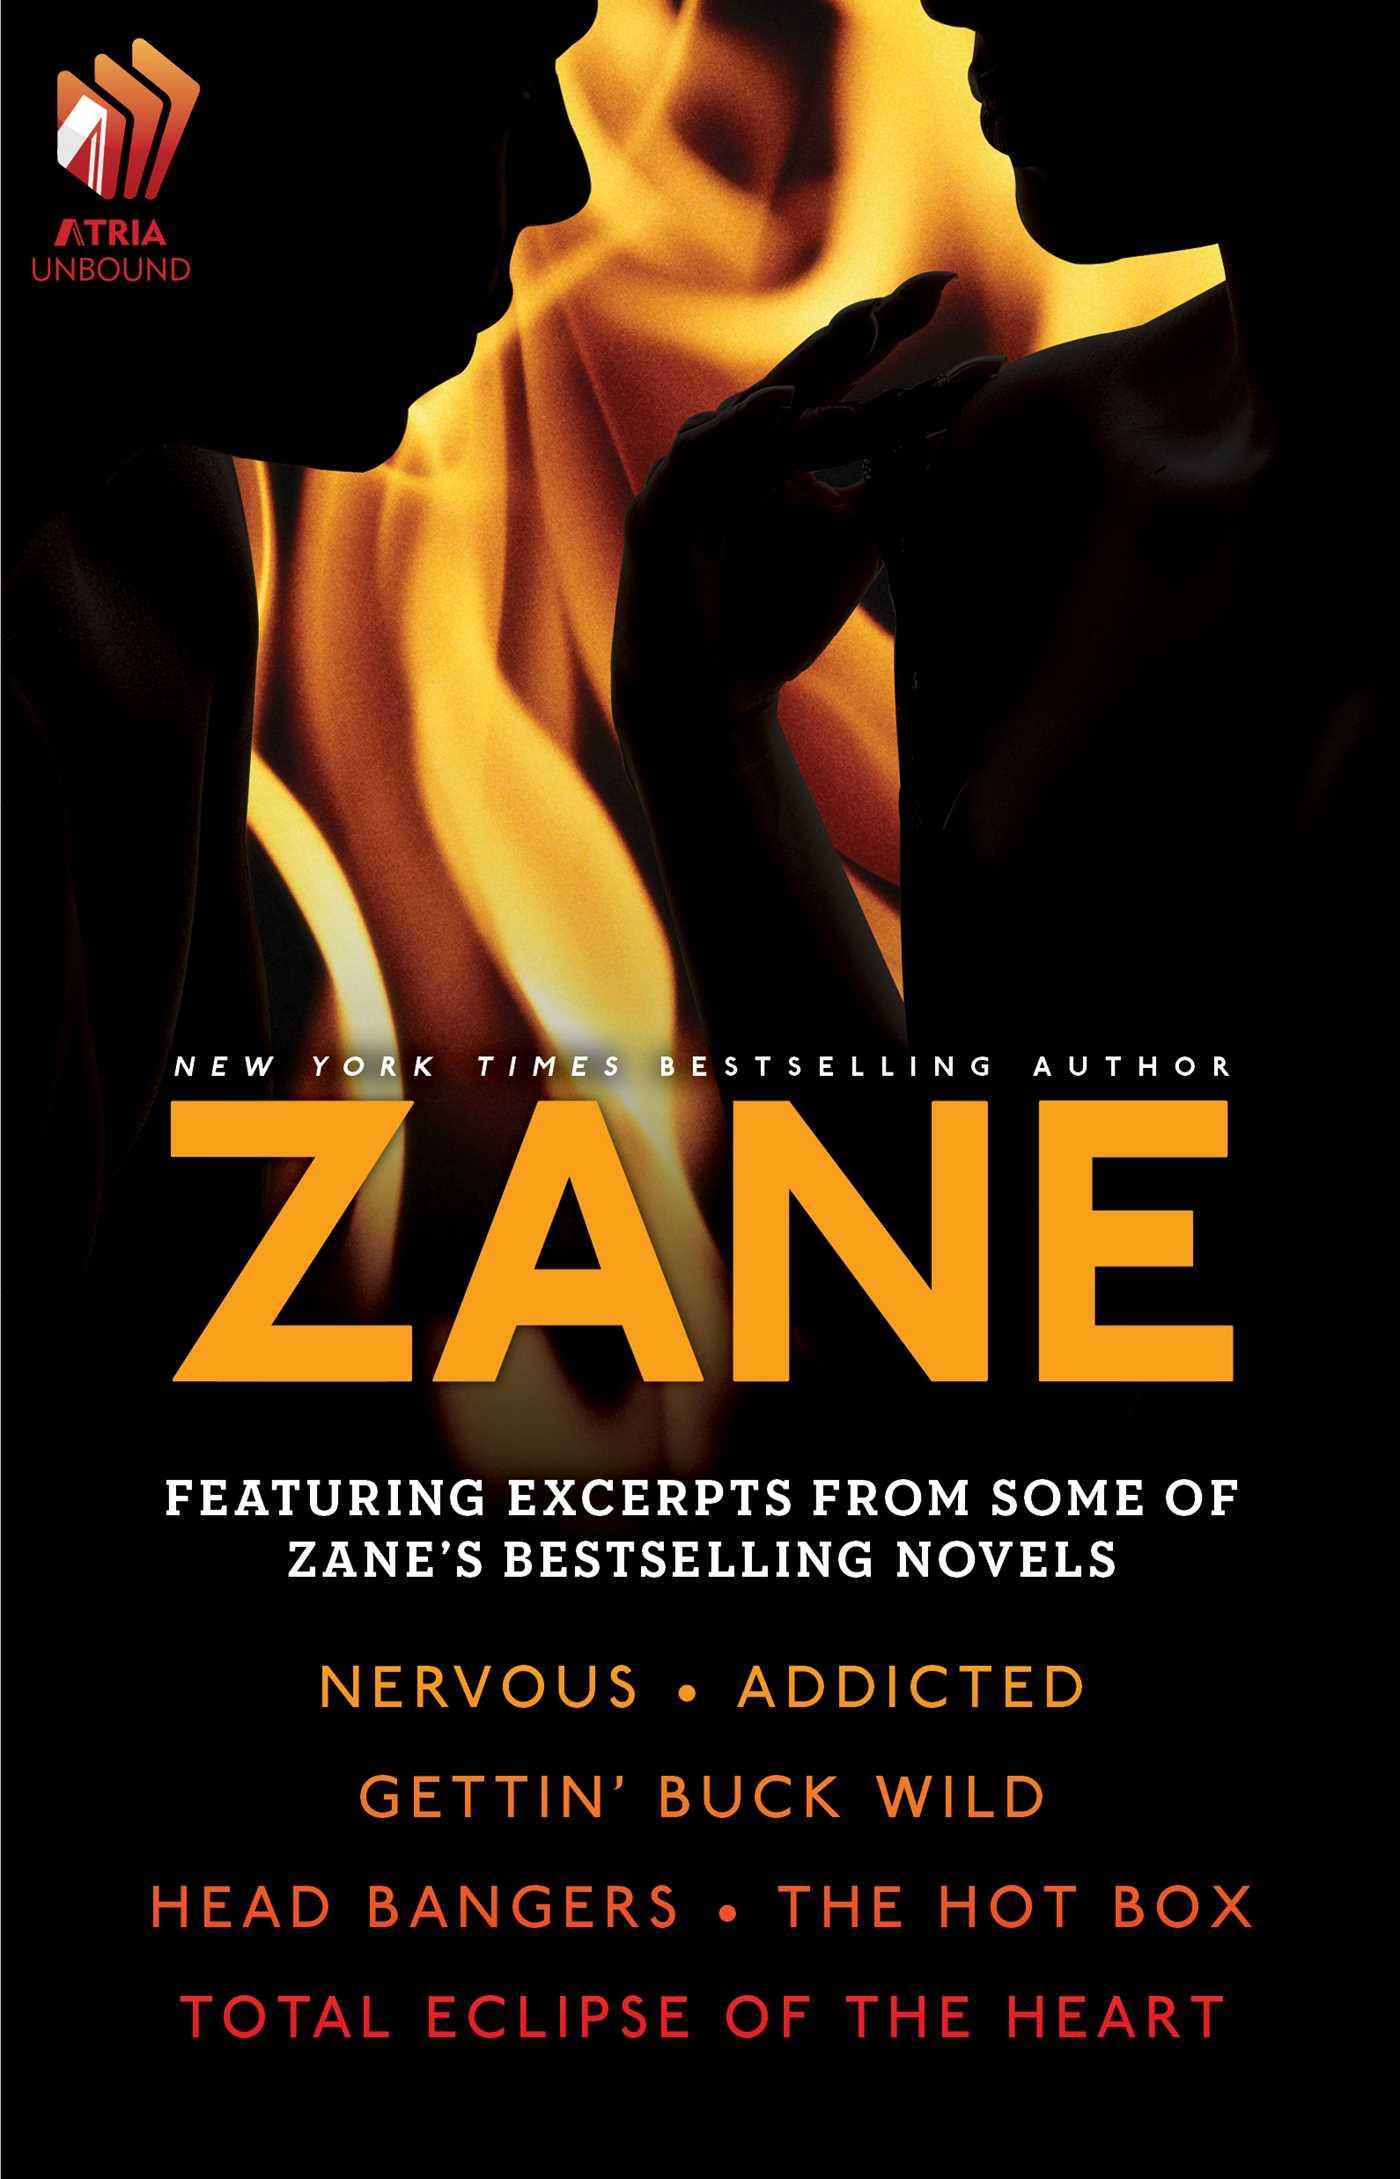 Zane ebook sampler 9781451683875 hr